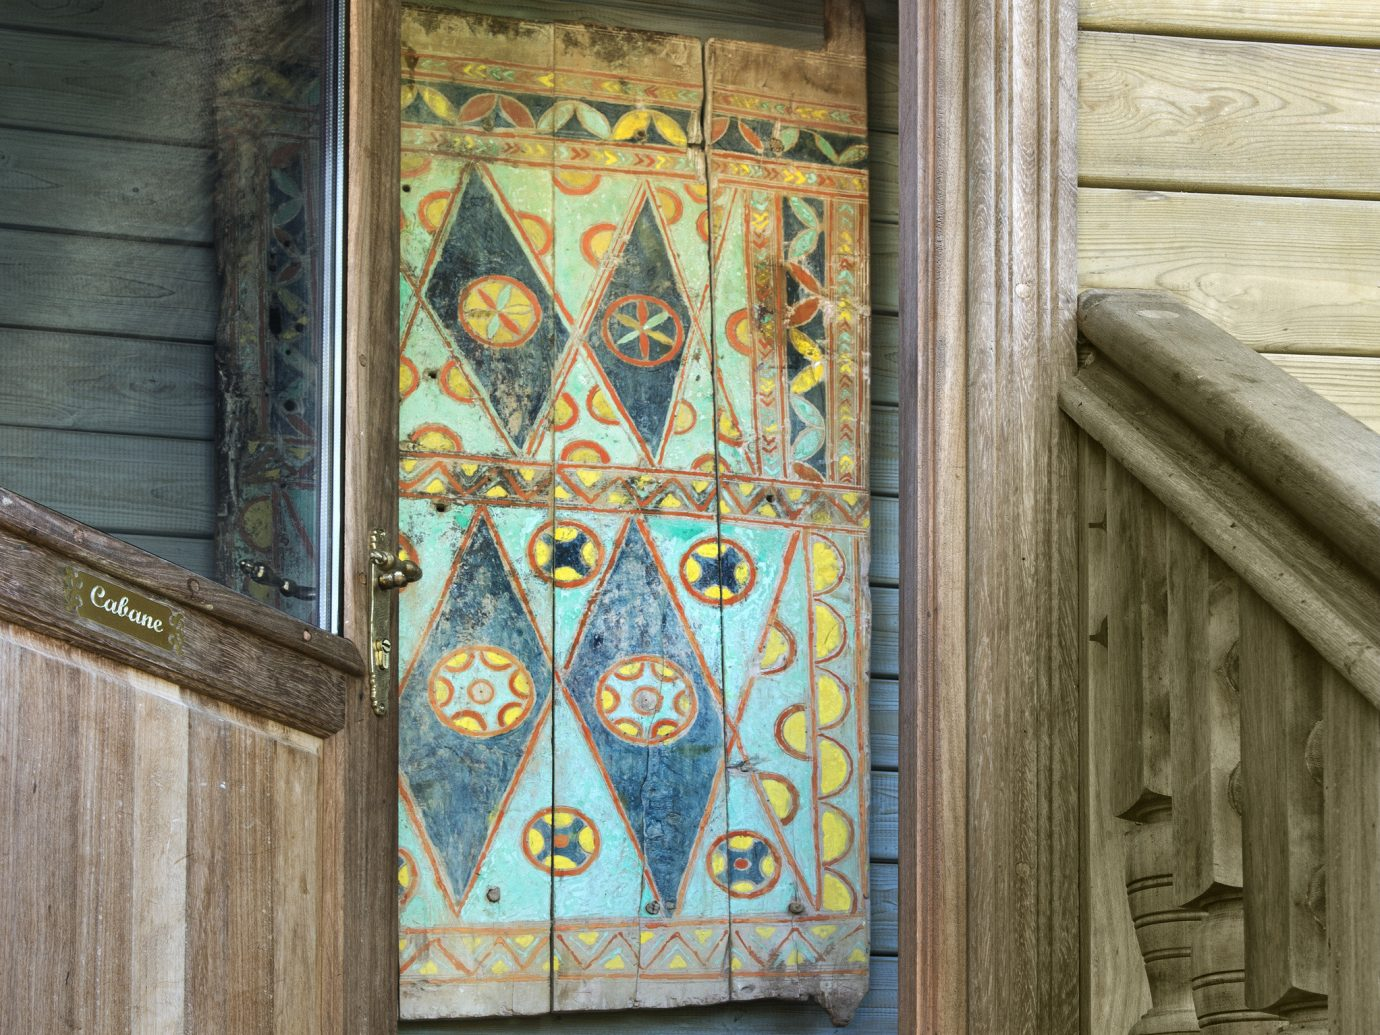 Hotels building wall house window door wood wooden art glass interior design facade material dirty